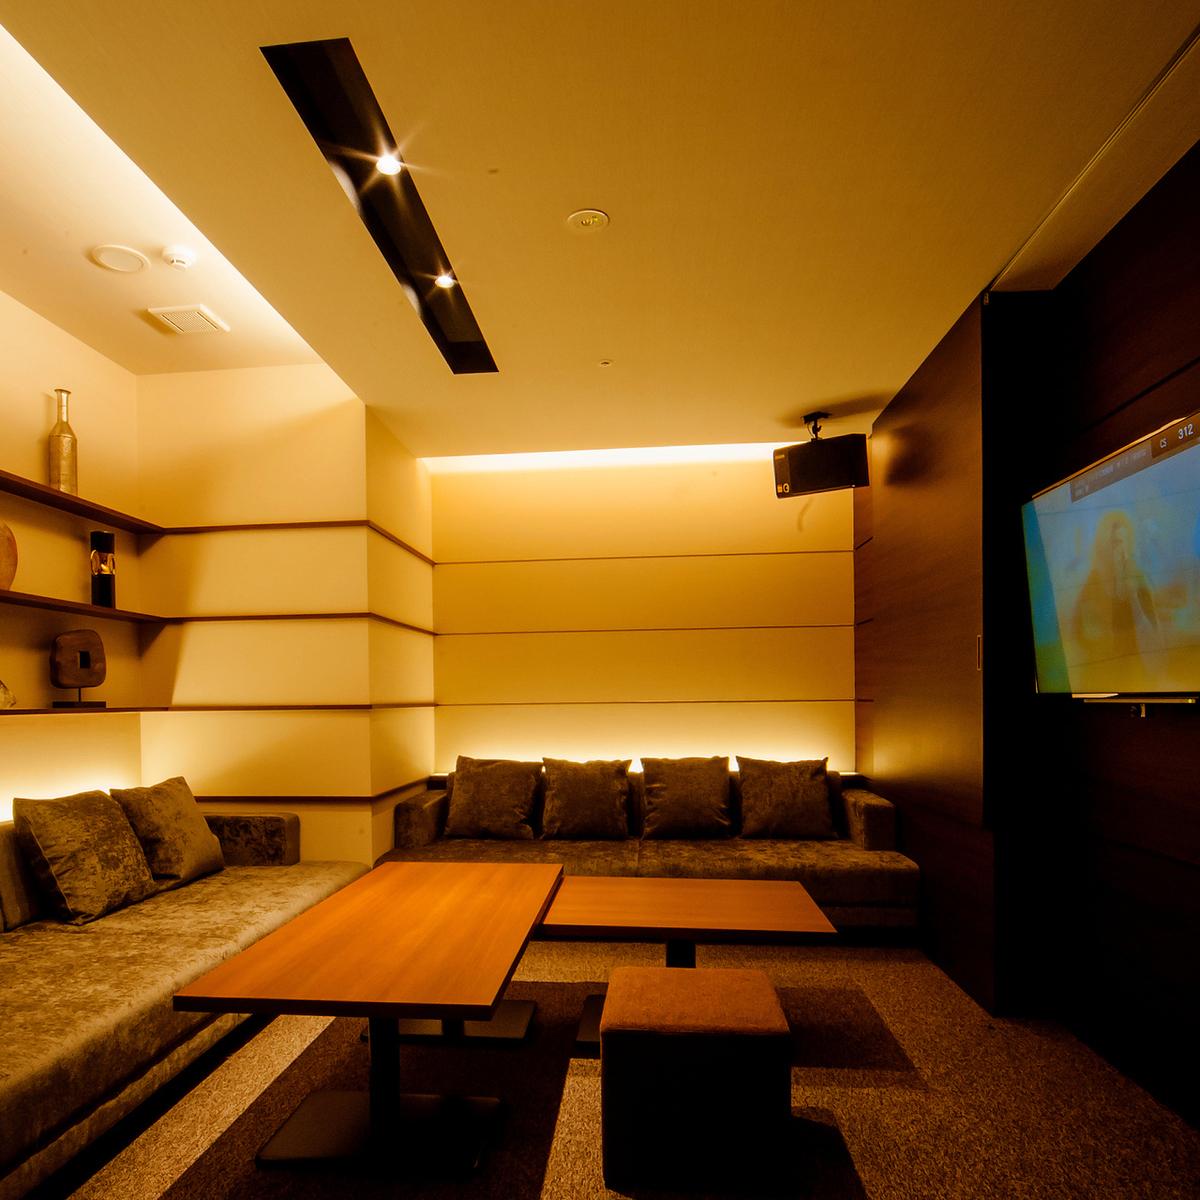 【VIP ROOM 012】私人包房,最多可容納6人/私人型,融合寬敞典雅現代。配備衛生間。你可以廣泛使用它。